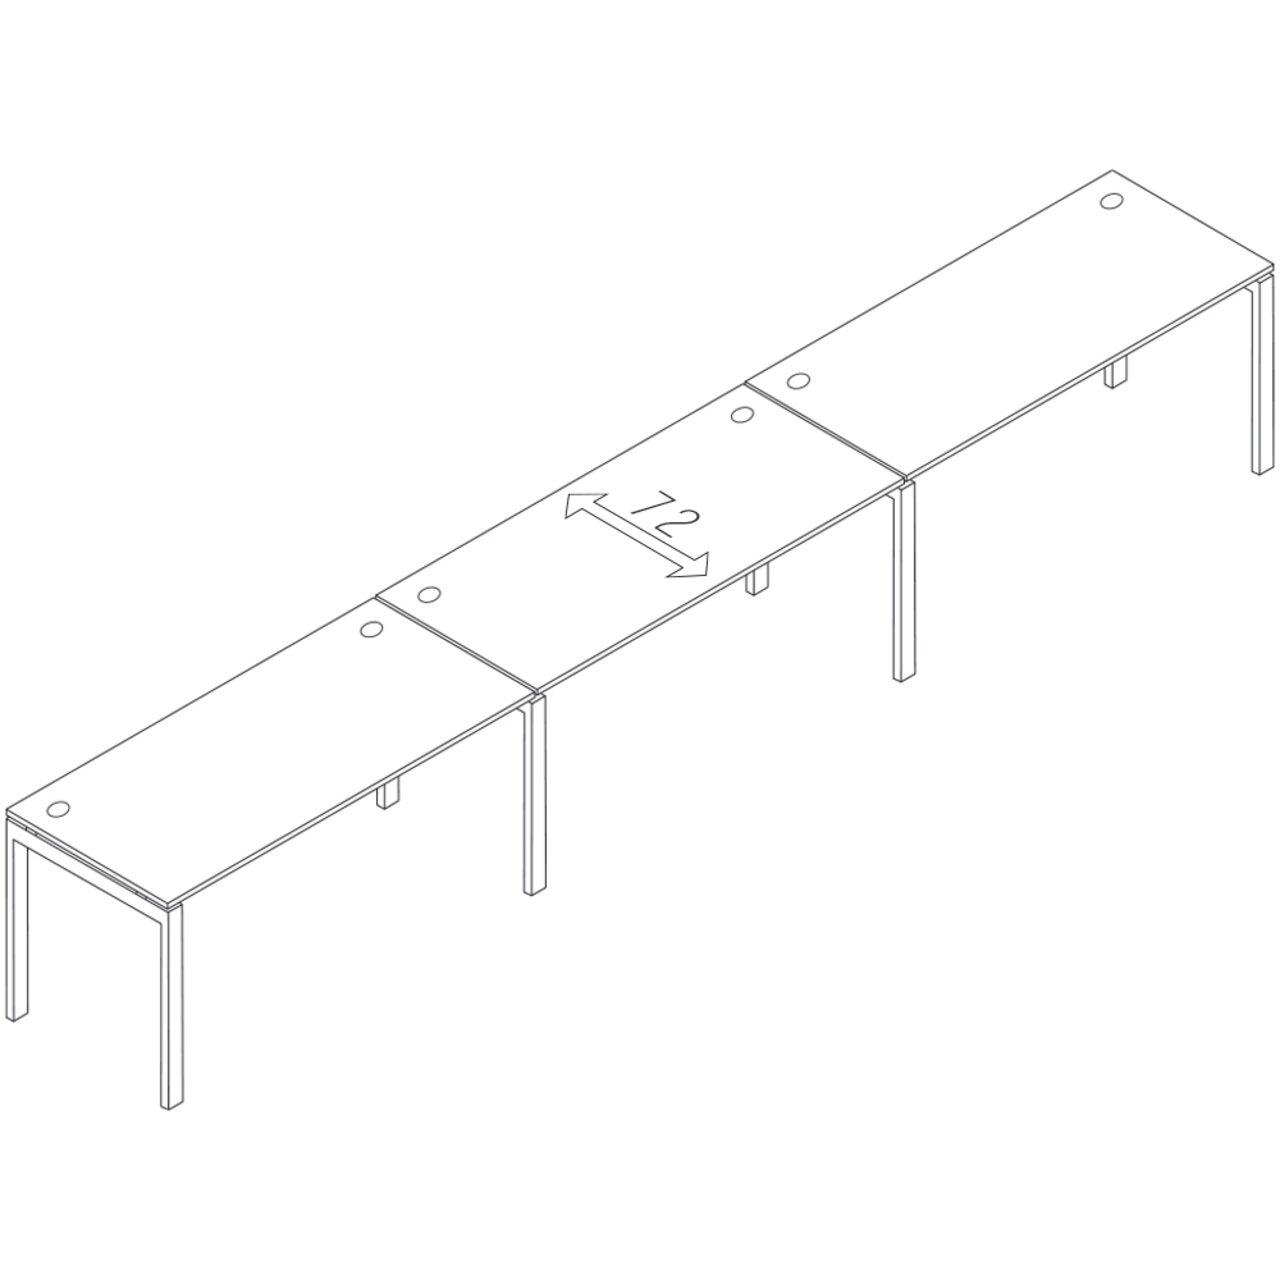 Бенч-система на 3 места линейная  TREND 480x72x75 - фото 1